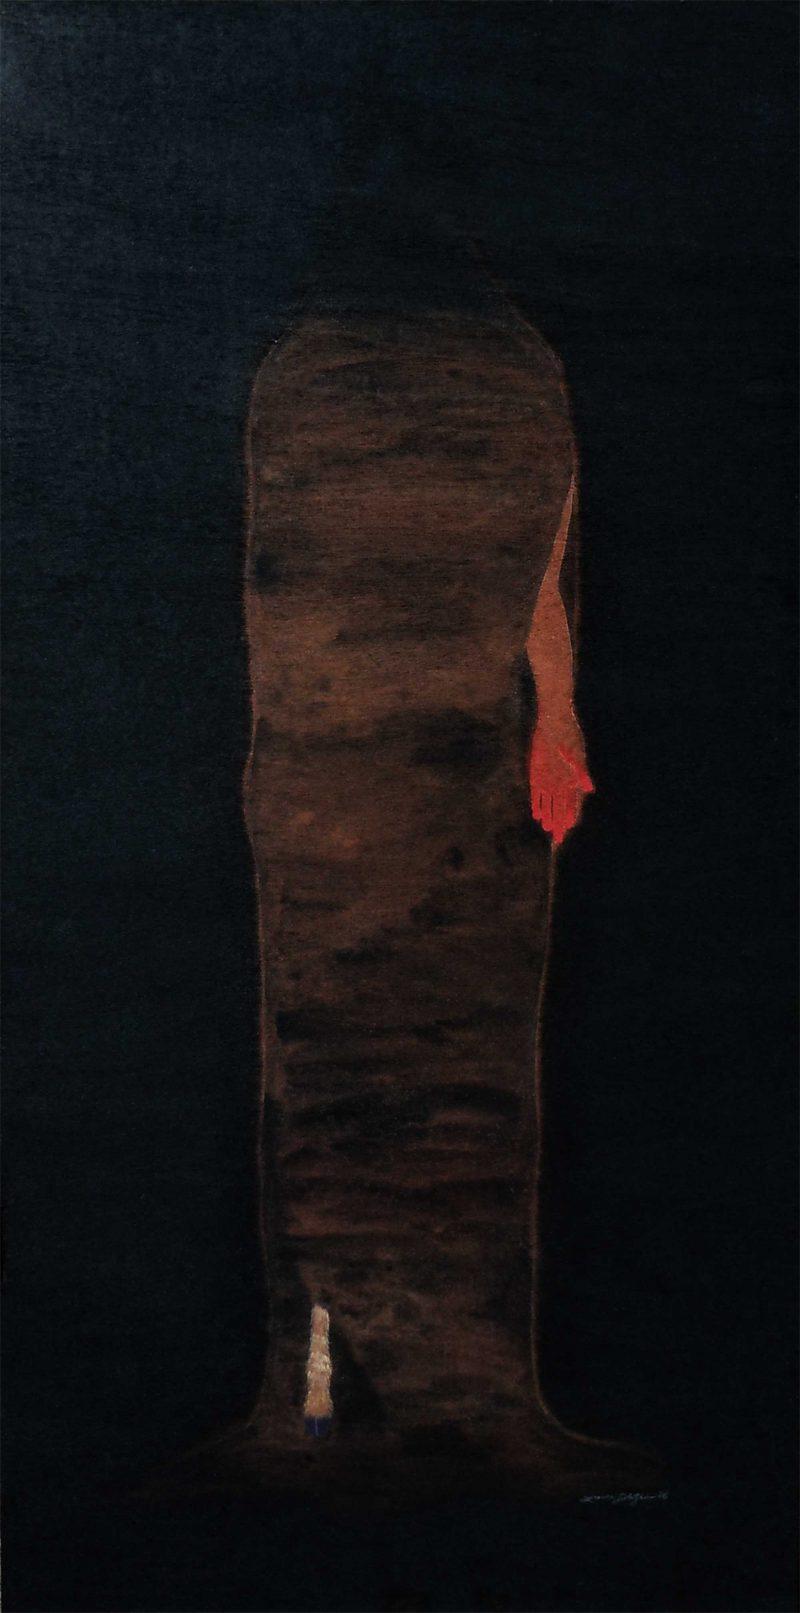 "The Cave (c) 2016 24"" x 48"" gouache/charcoal/milk on reclaimed wood veneer"